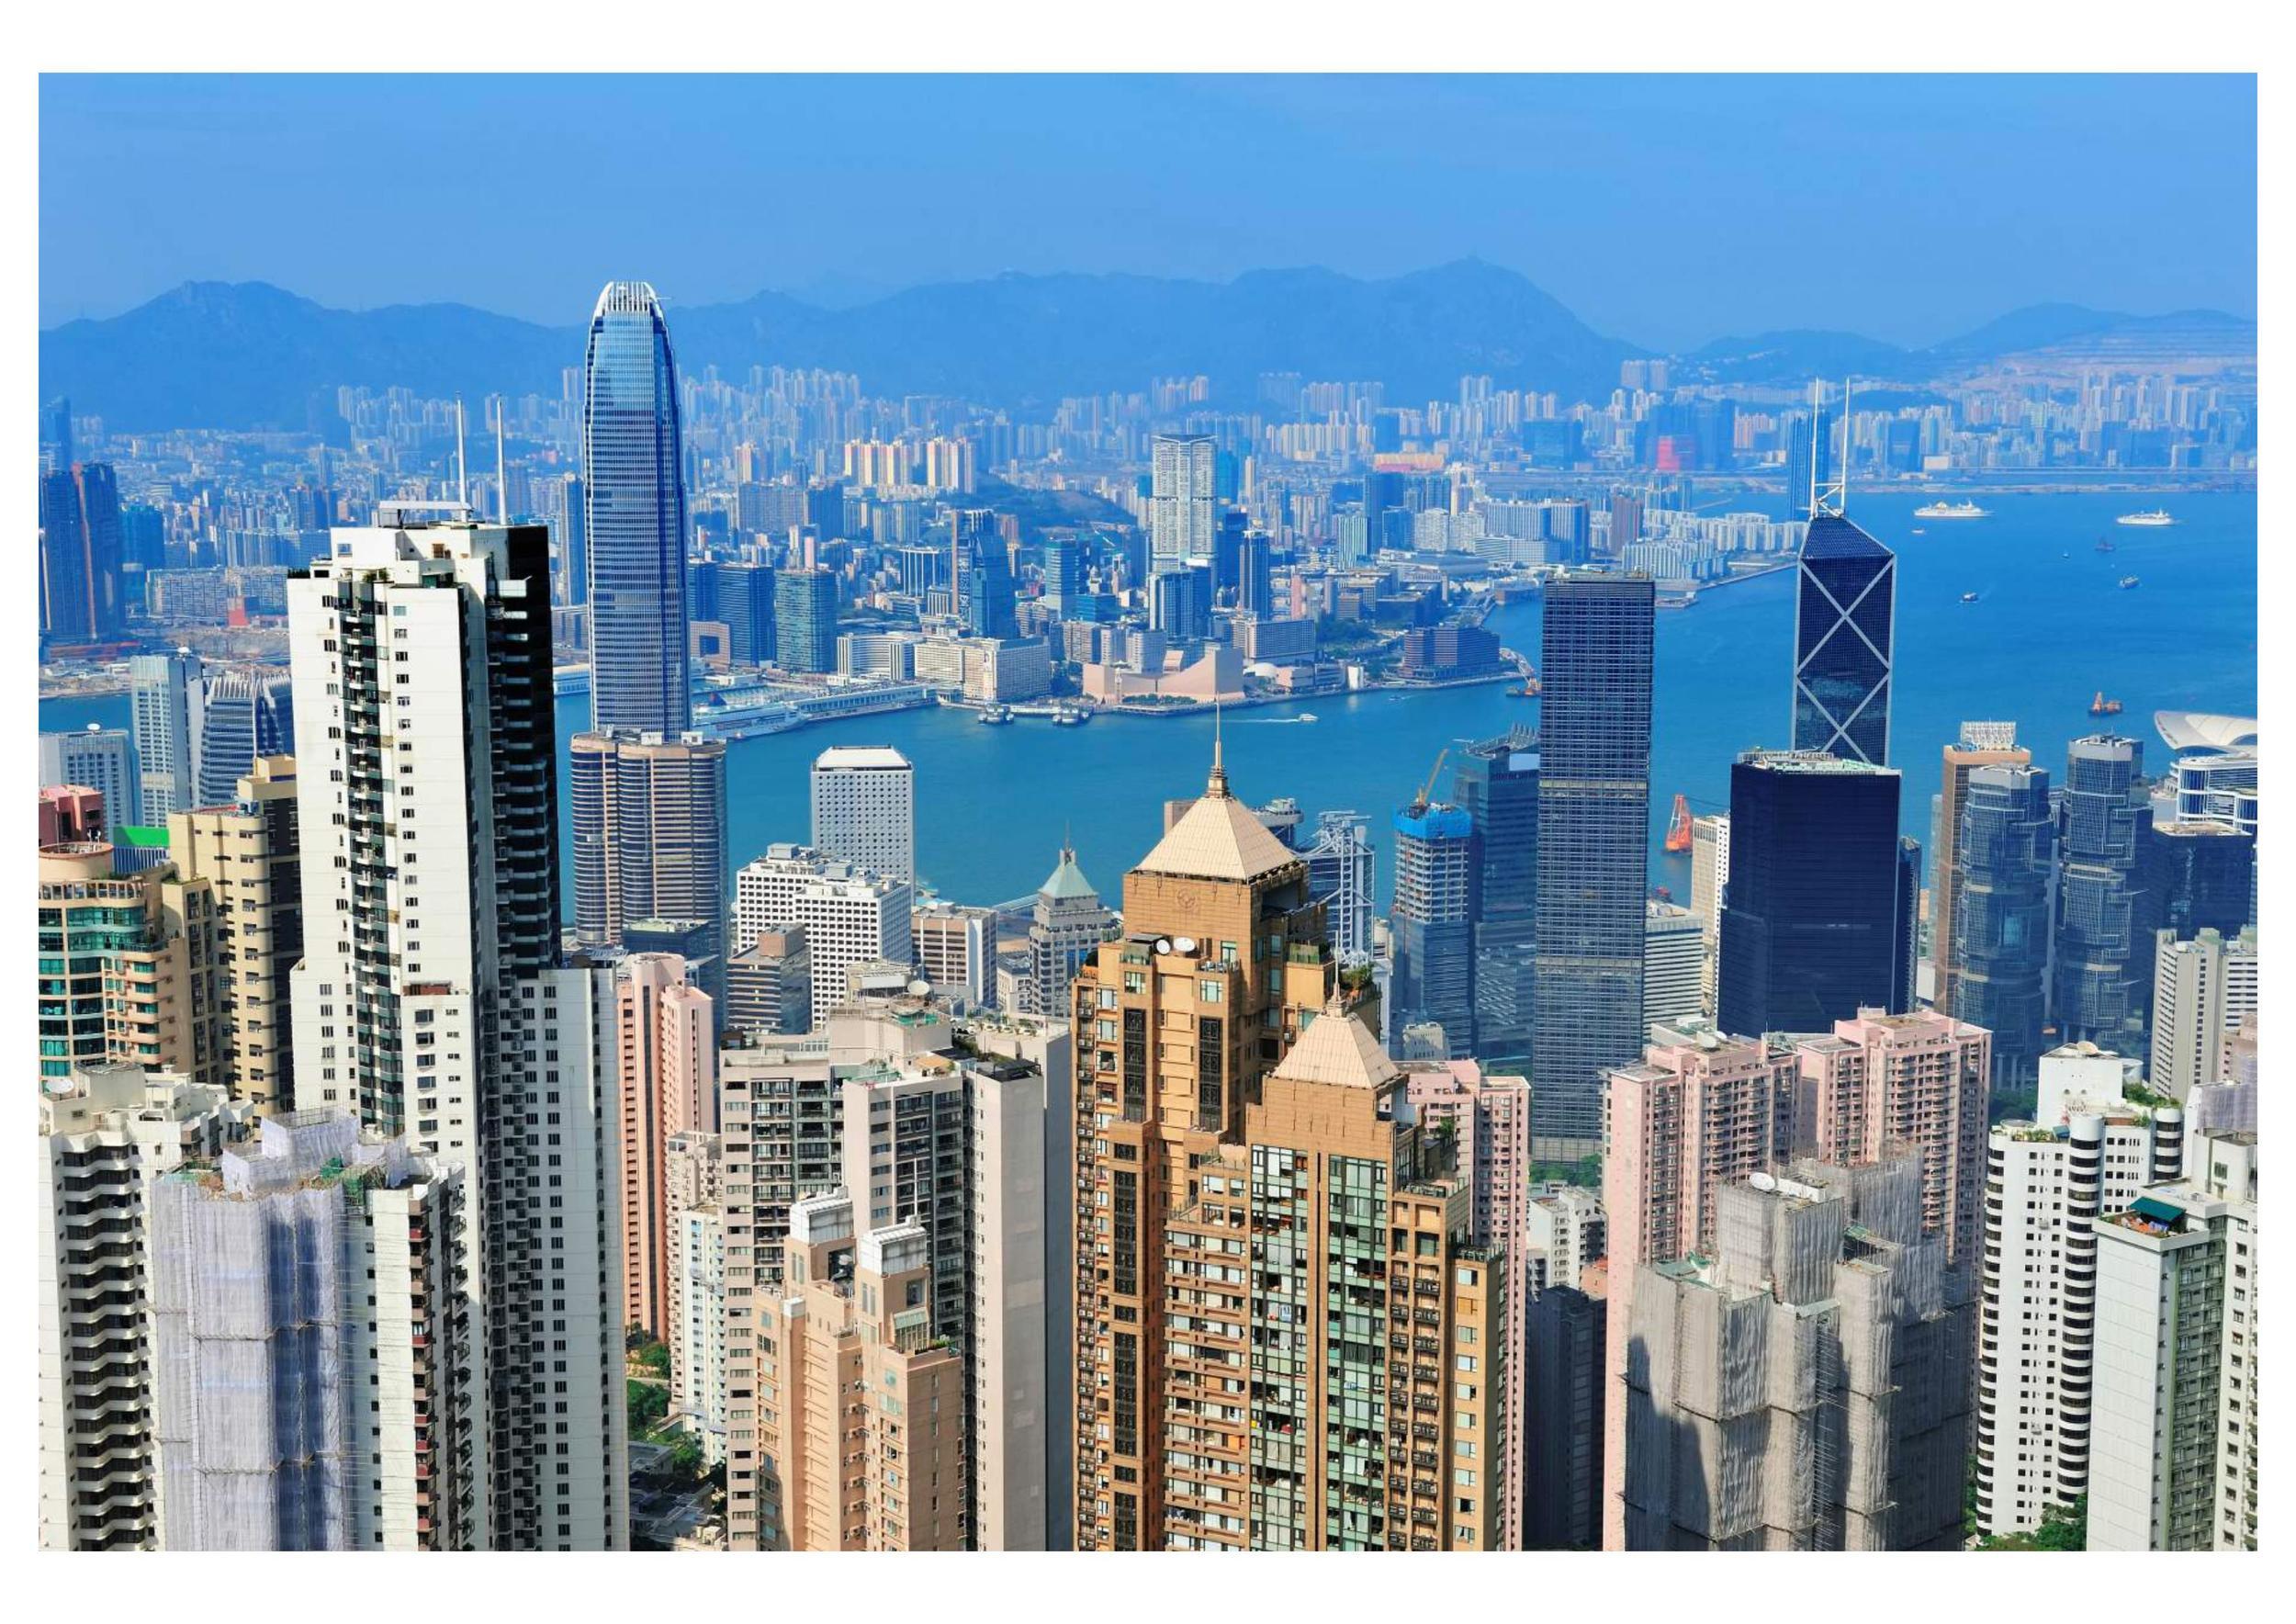 CONTACT    HONG KONG OFFICE   PROMO + RETAIL LTD  Flat J. 6/F, Block 3 - Camelpaint building - 60 Hoi Yuen road - Kwun Tong - Kowloon - Hong Kong   E:  sales @promoplusretail.com